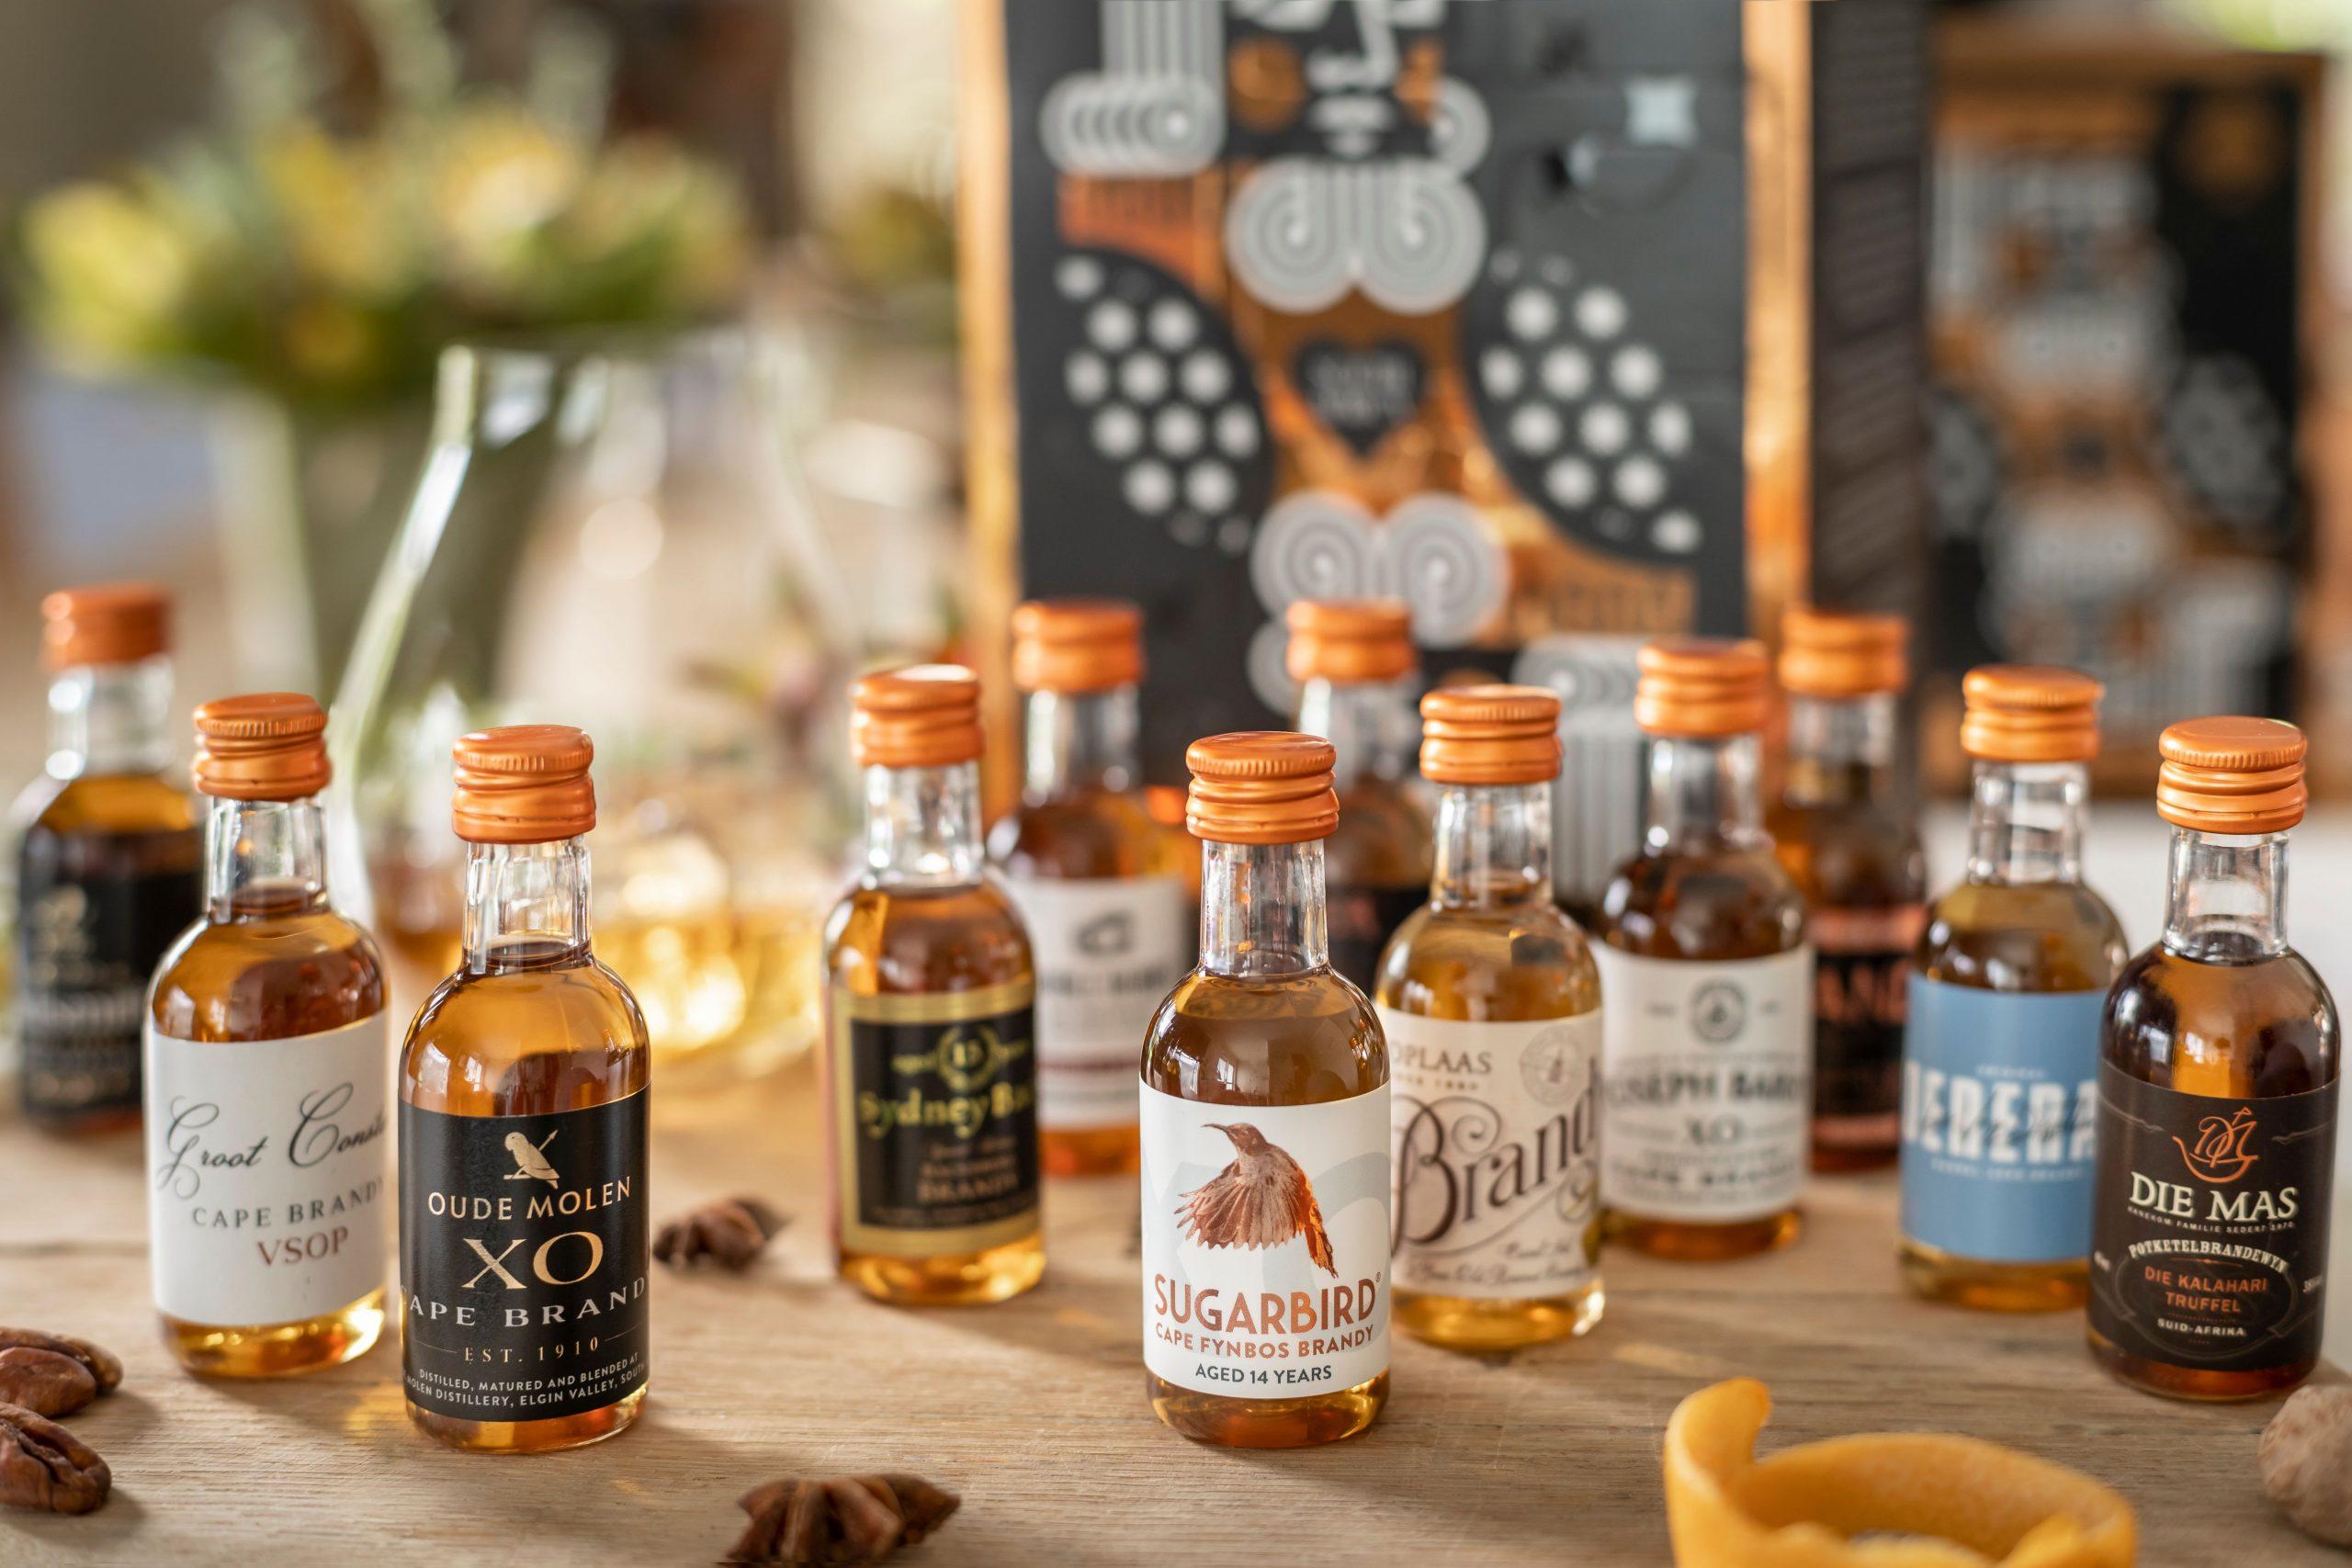 Sugarbird and Brandy Friends Showcase SA Distilling Heritage